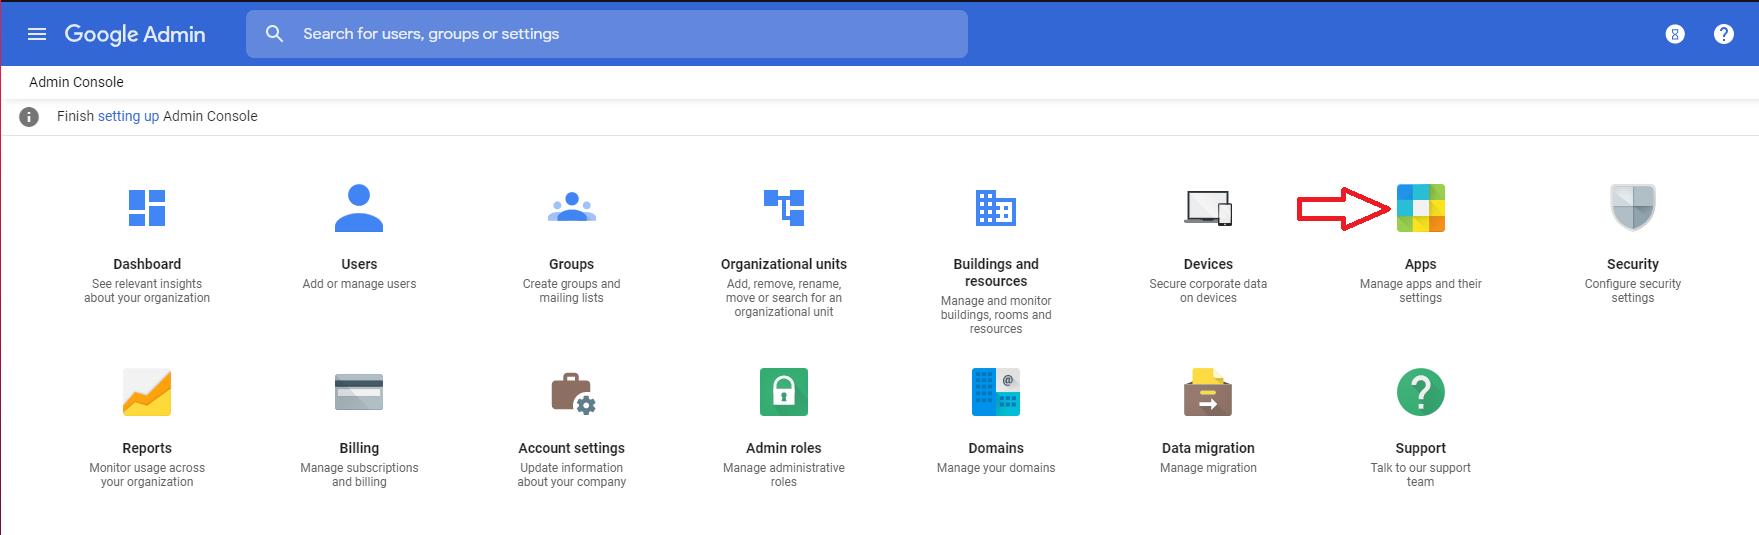 G Suite marketplace applications